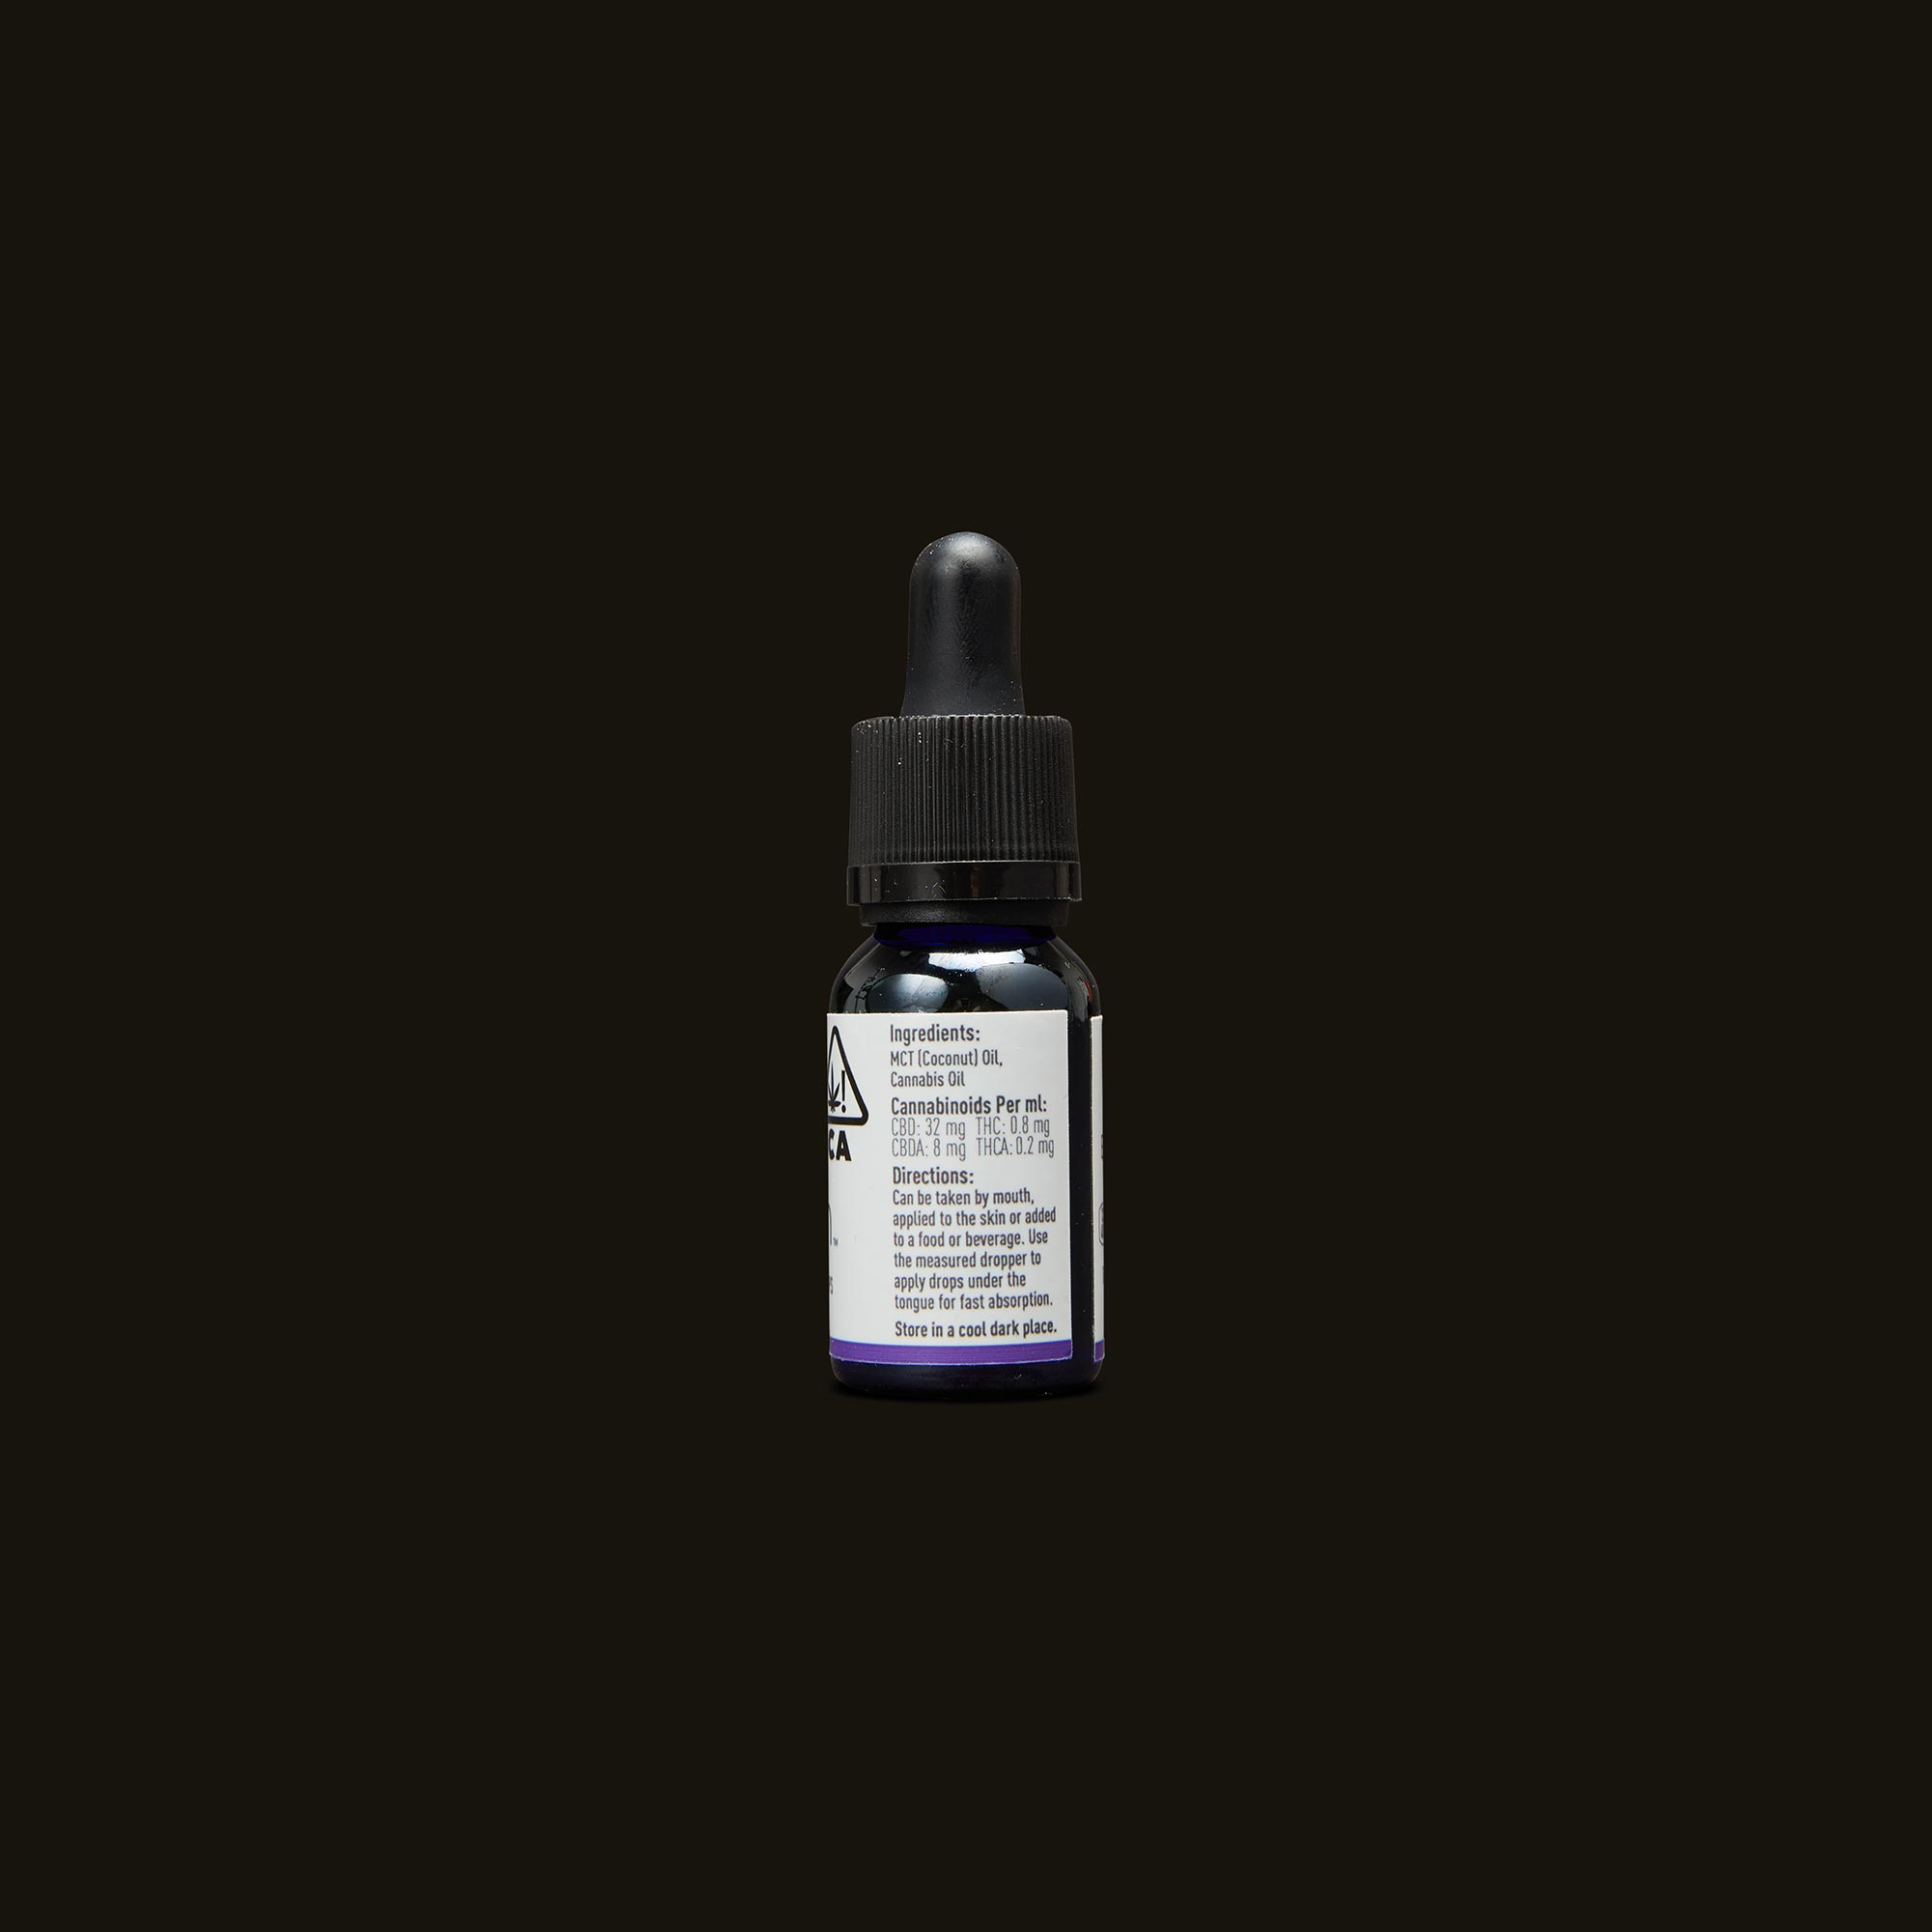 Care By Design 40:1 Full Spectrum CBD Drops - 0.5oz Ingredients